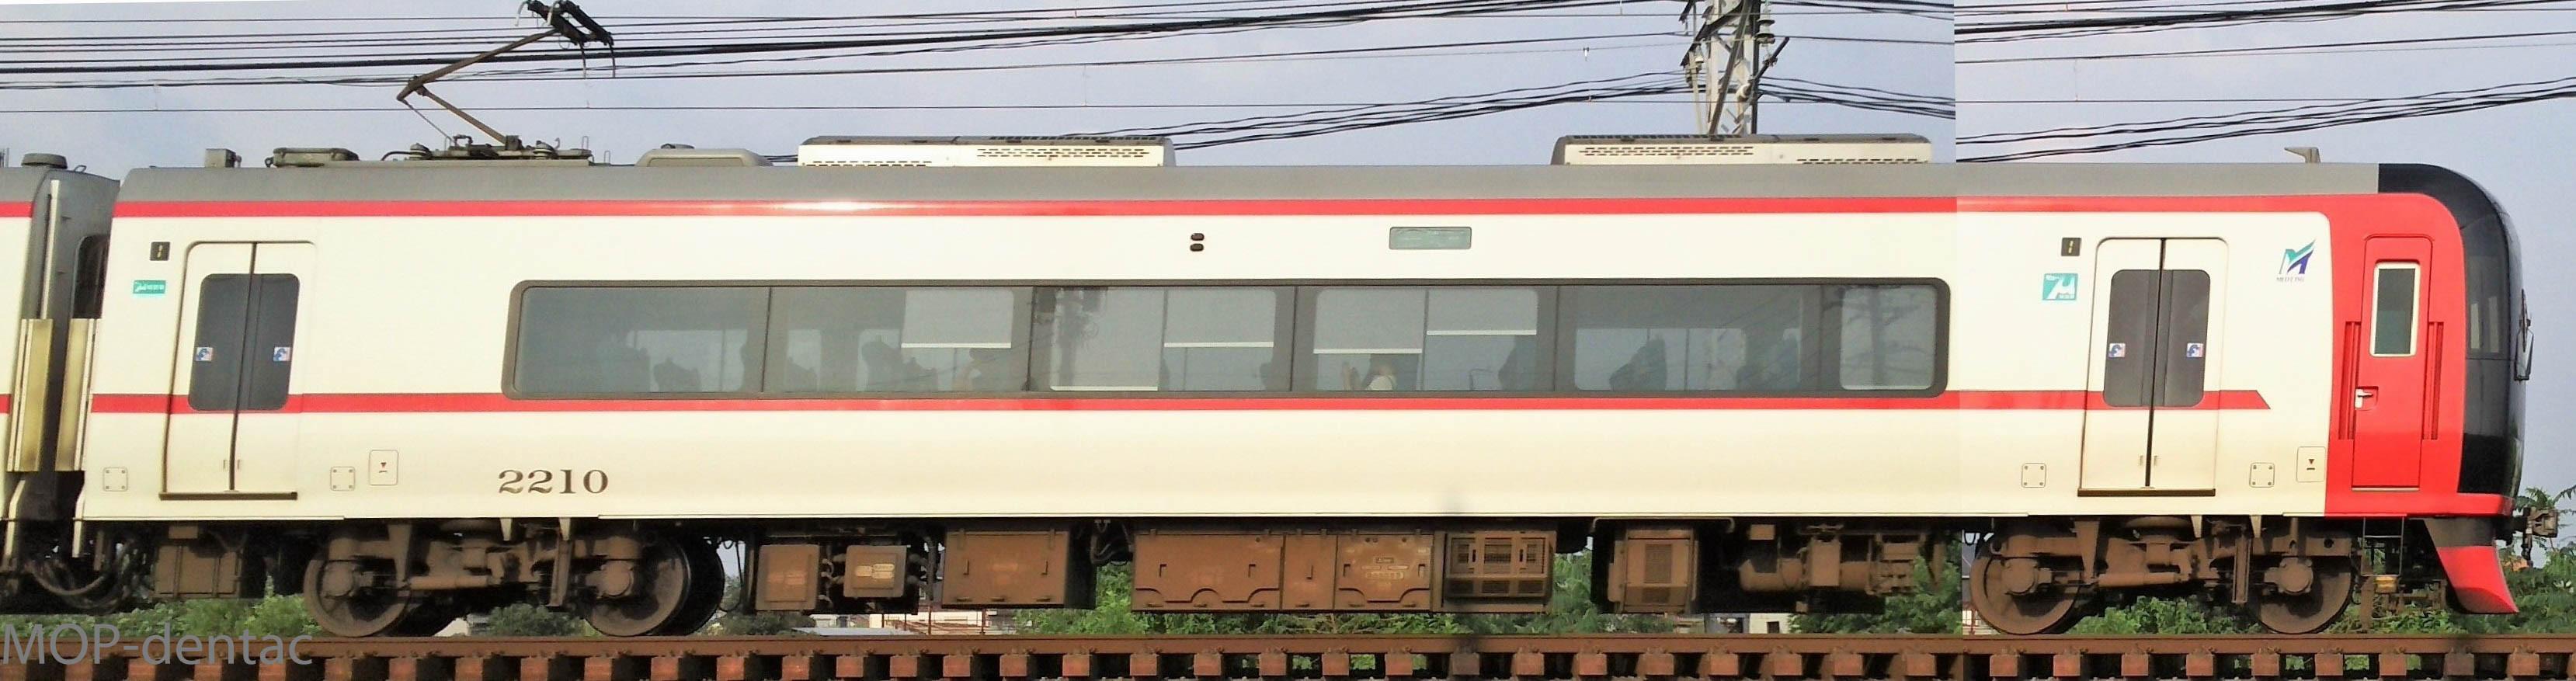 名鉄2200系2210F 海側 : Made of 紙